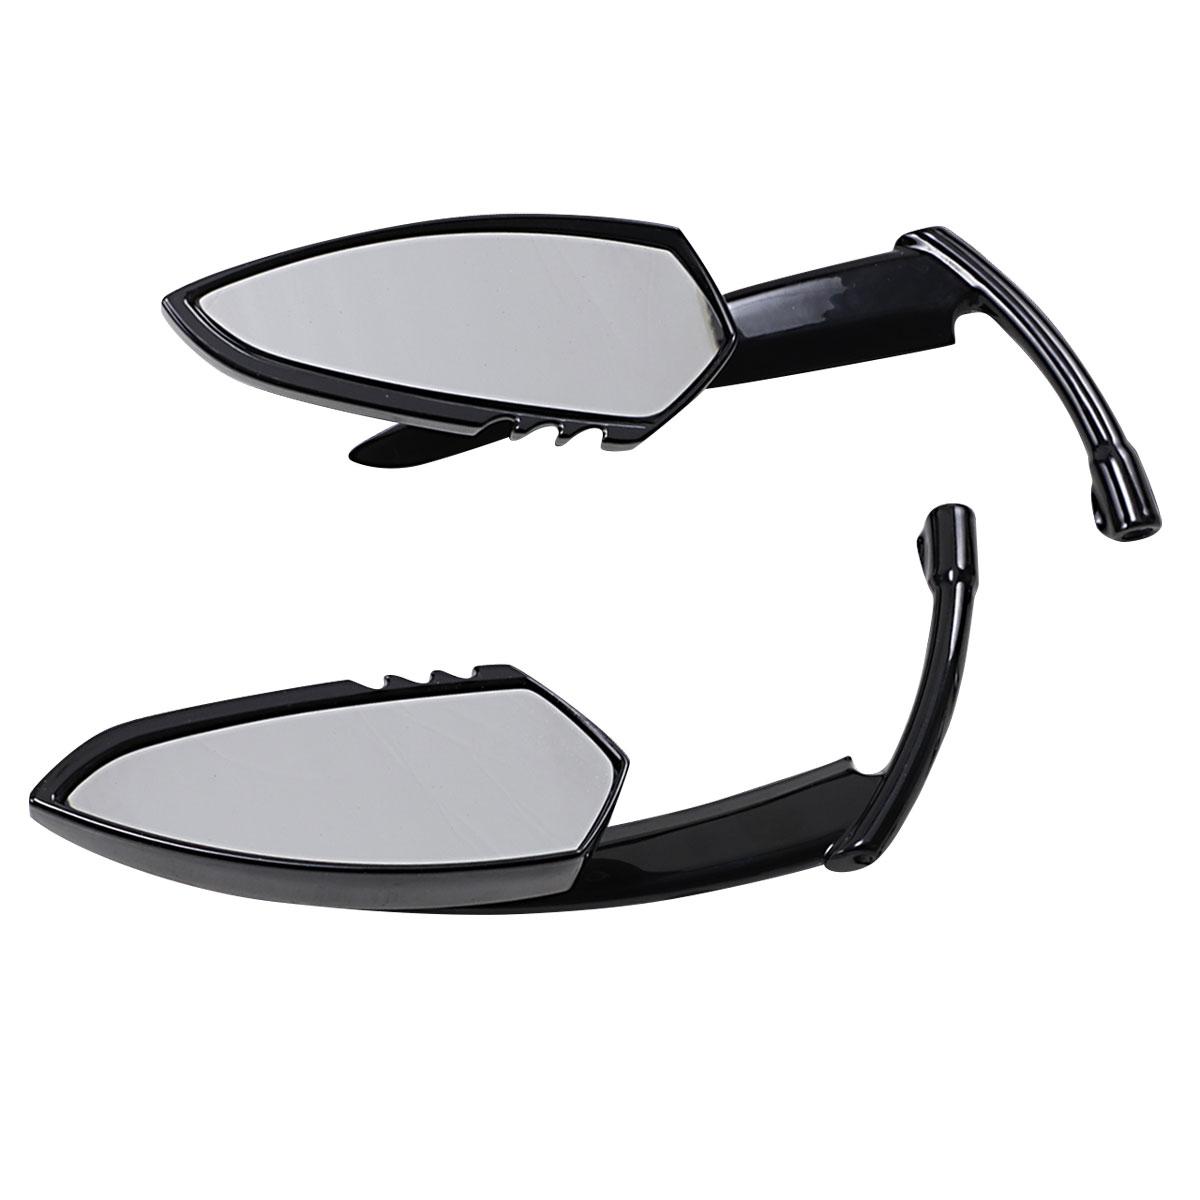 Kuryakyn Gloss Black Scythe Mirror Set 1760 Jpcycles Com